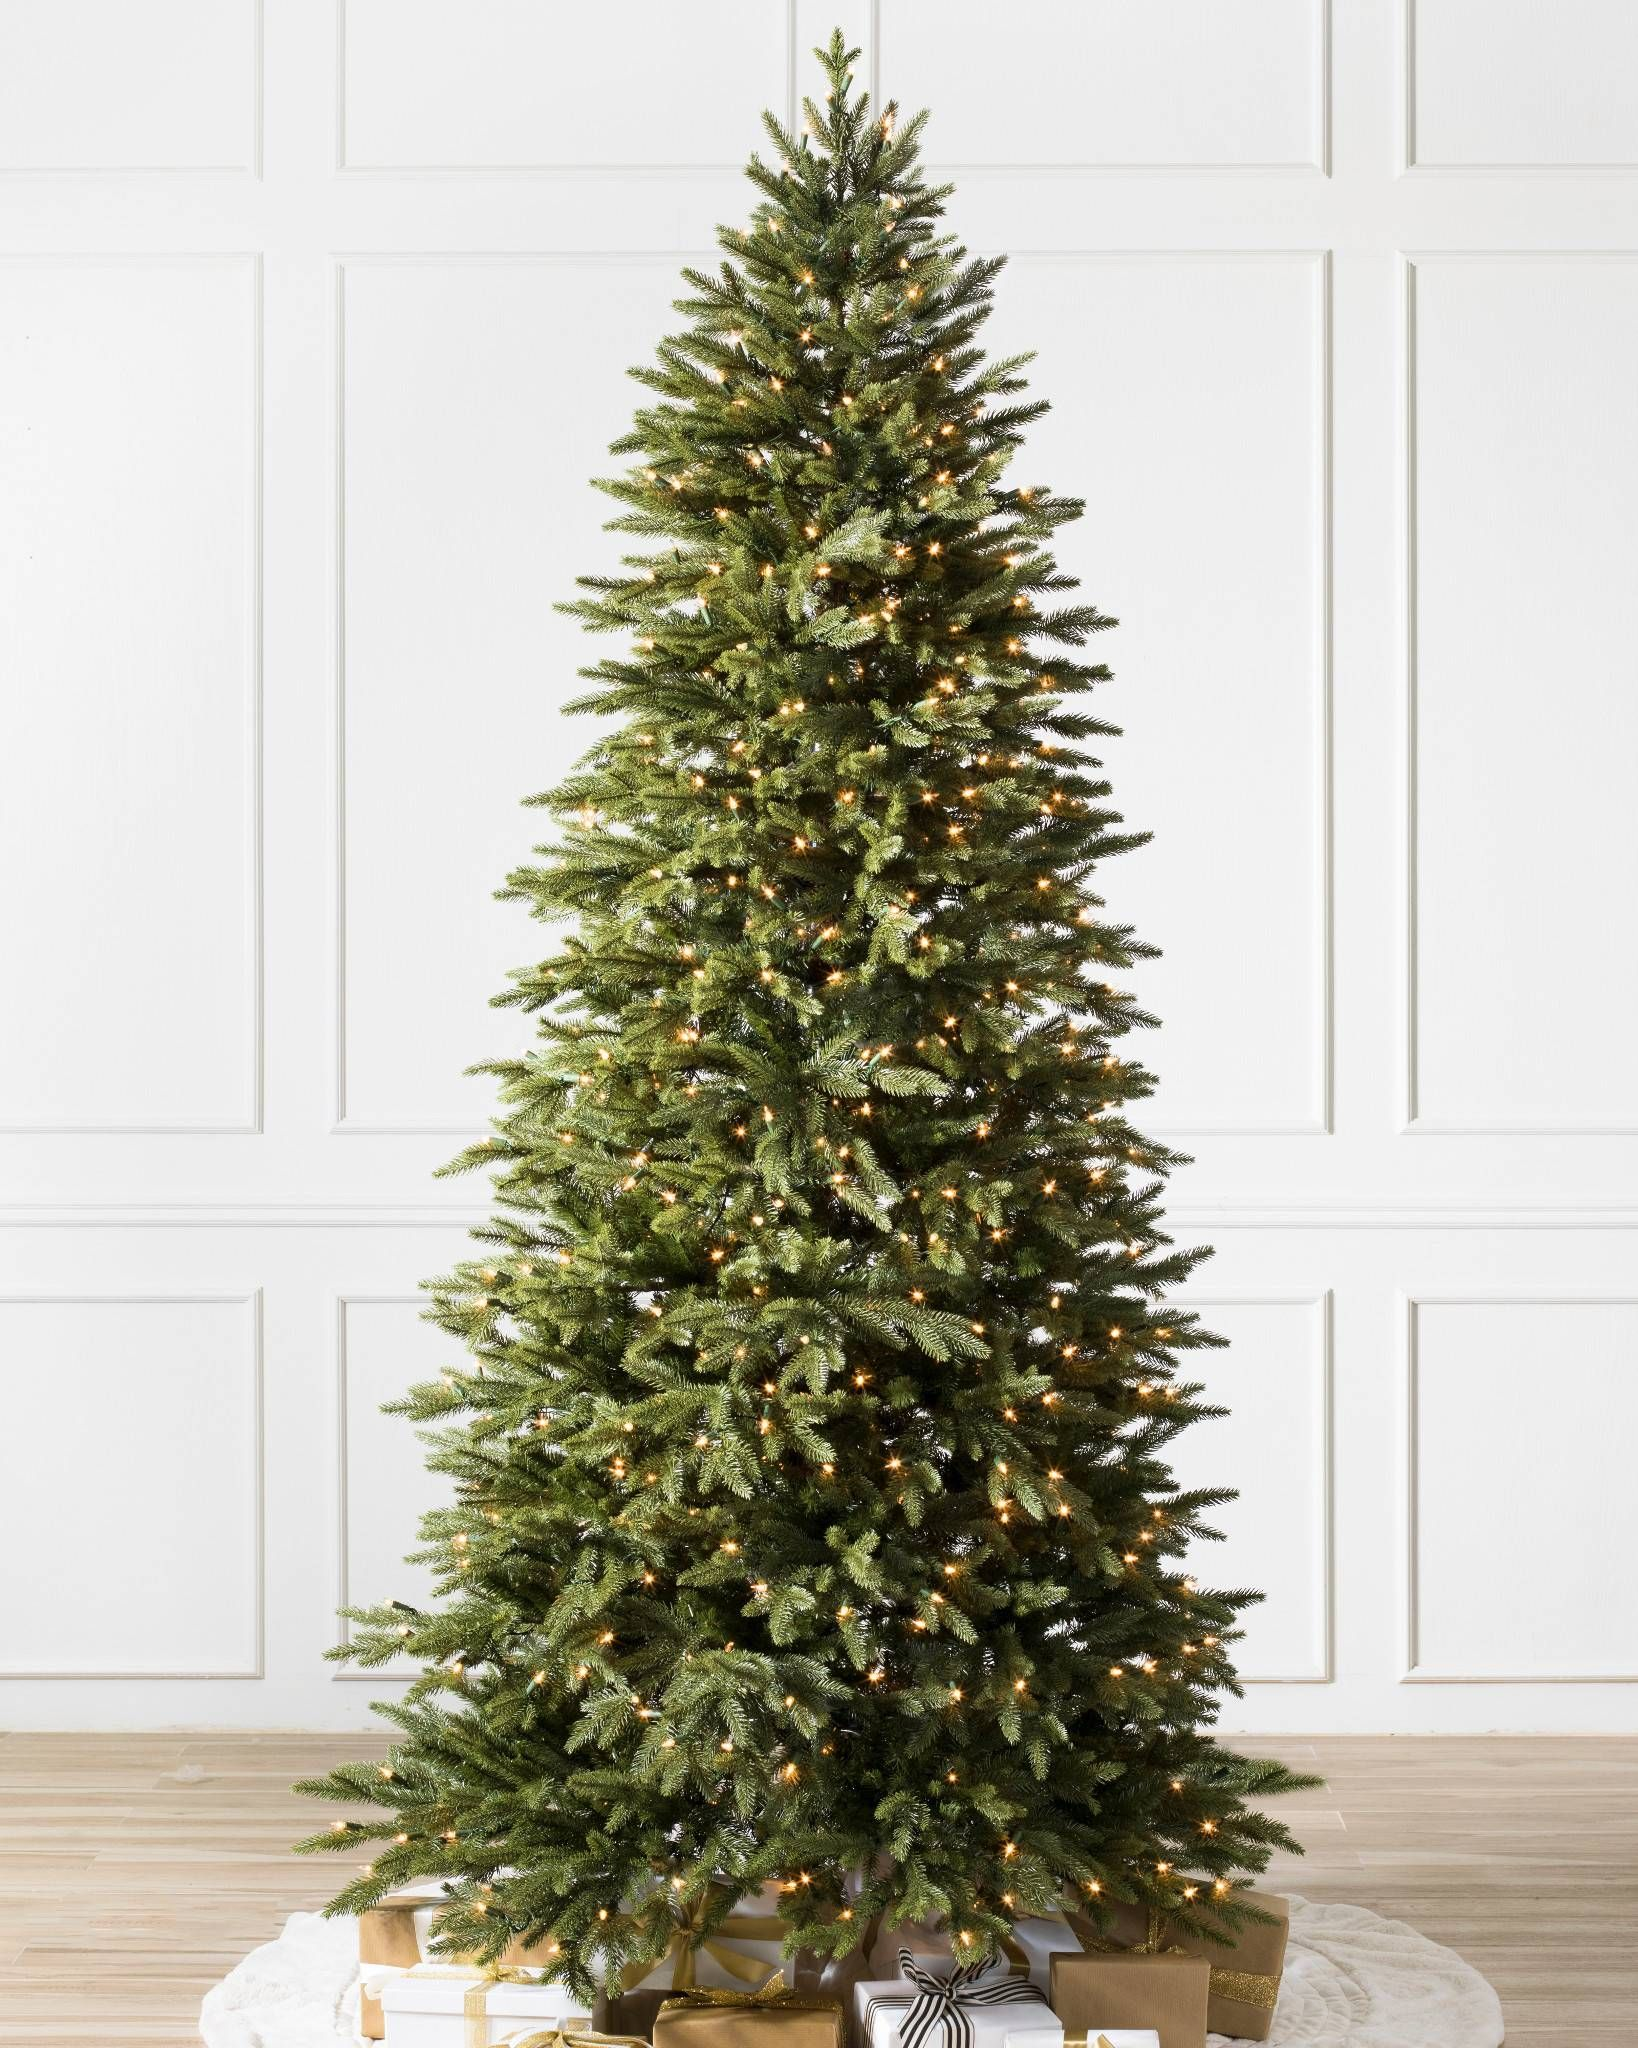 Silverado Slim Artificial Christmas Trees Balsam Hill In 2020 Realistic Artificial Christmas Trees Slim Christmas Tree Balsam Fir Christmas Tree